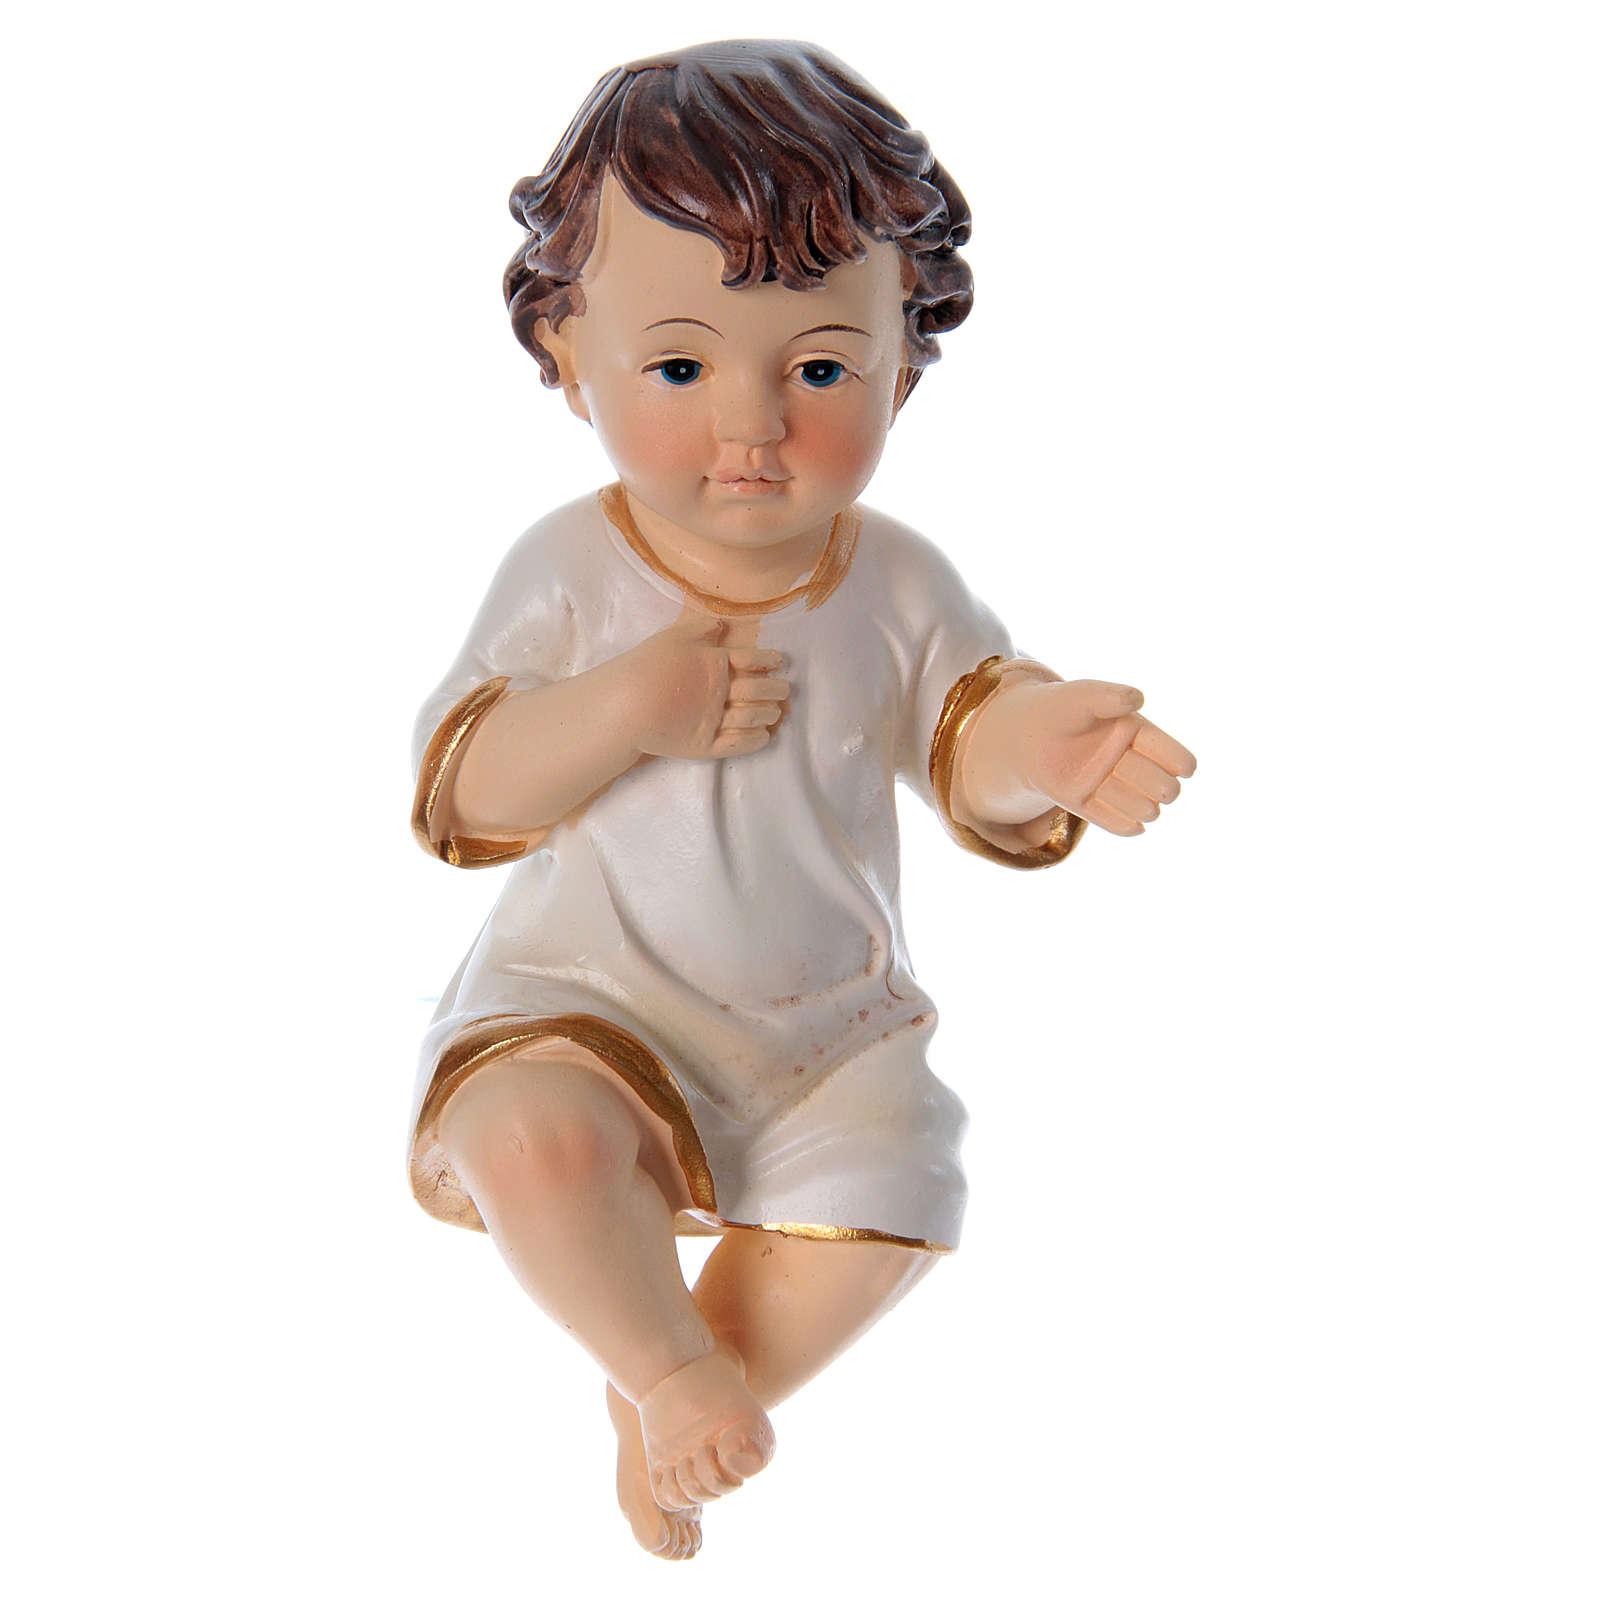 Bambinello veste bianca h reale 10 cm in resina 3